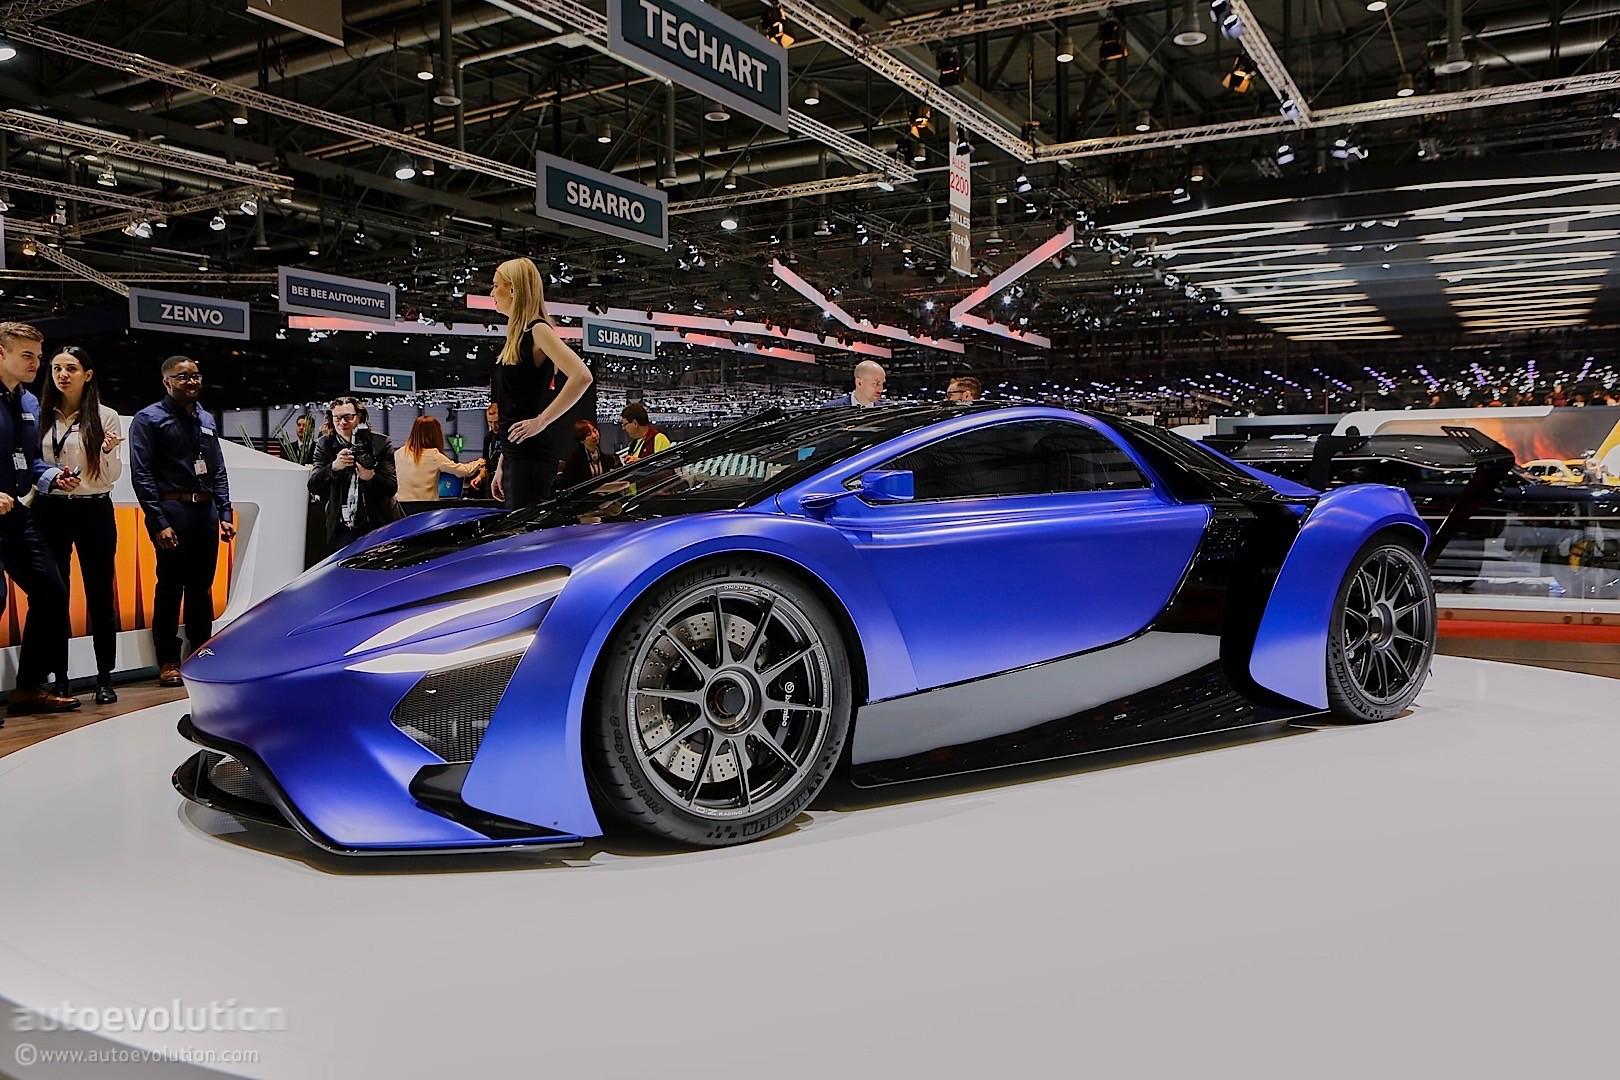 Techrules promises revolutionary propulsion system has - Auto motor show ...